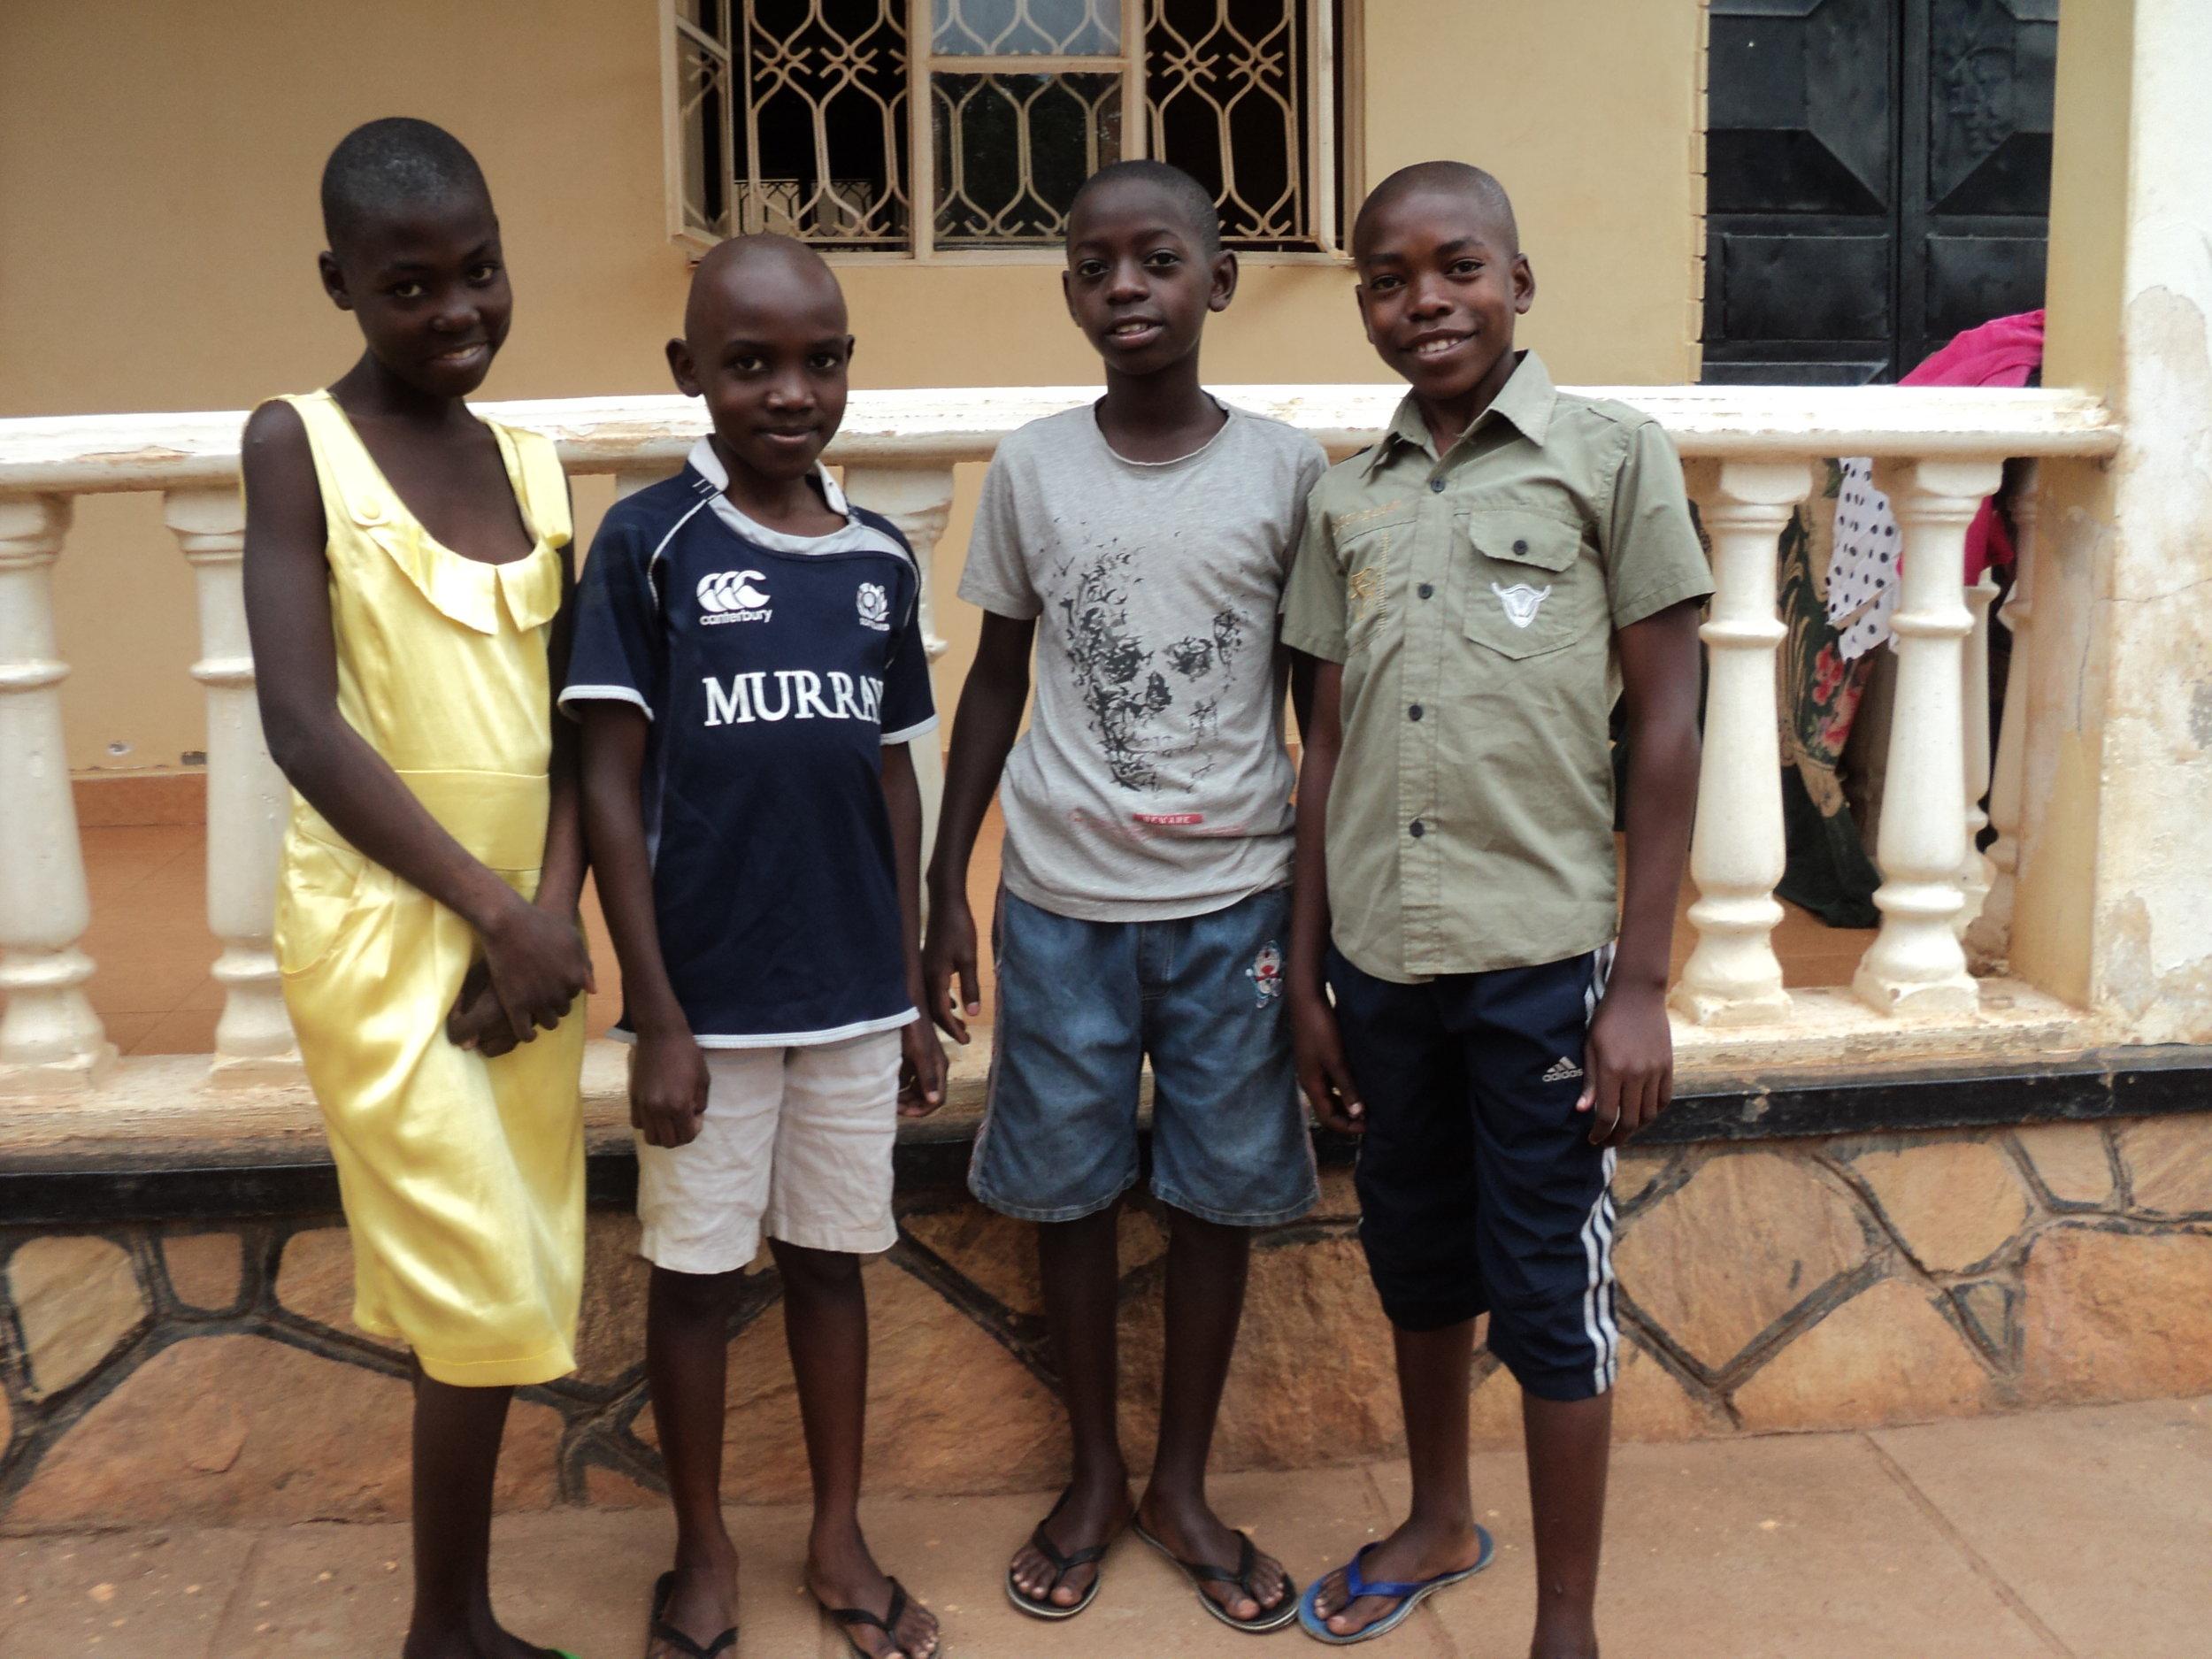 01 31 18 4 children.JPG